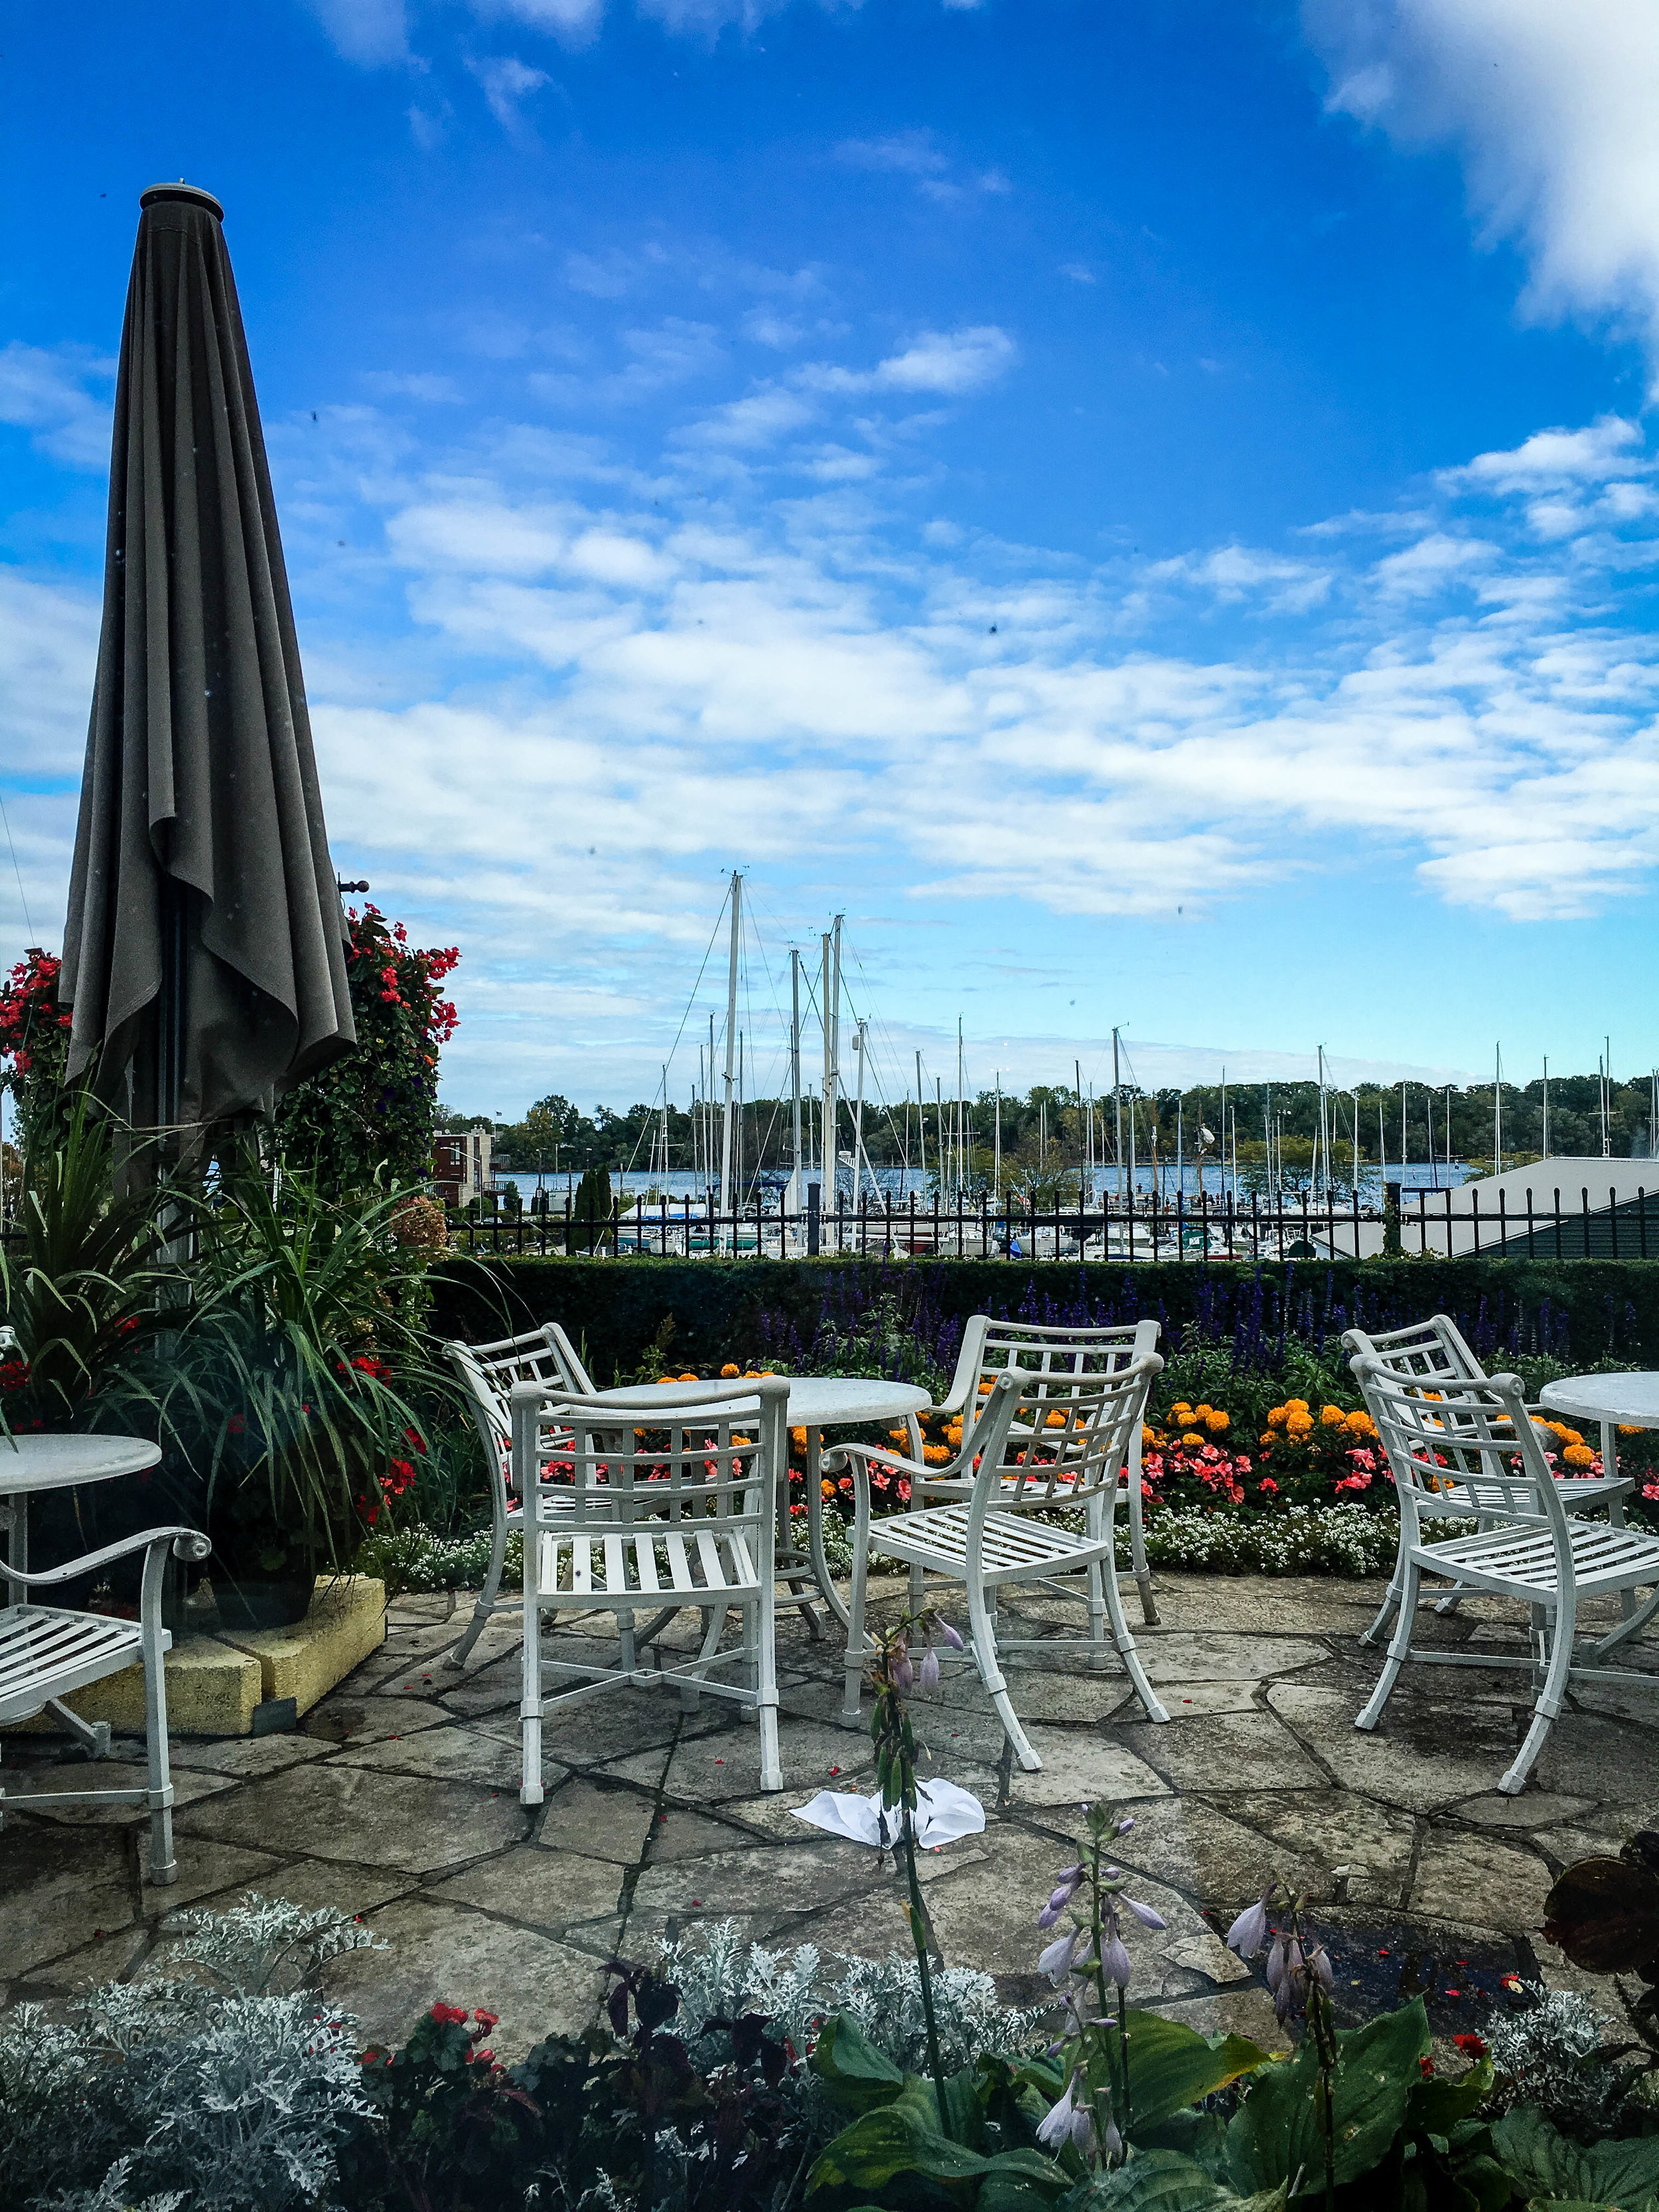 Niagara on the Lake marina view from the Tiara's restaurant terrace